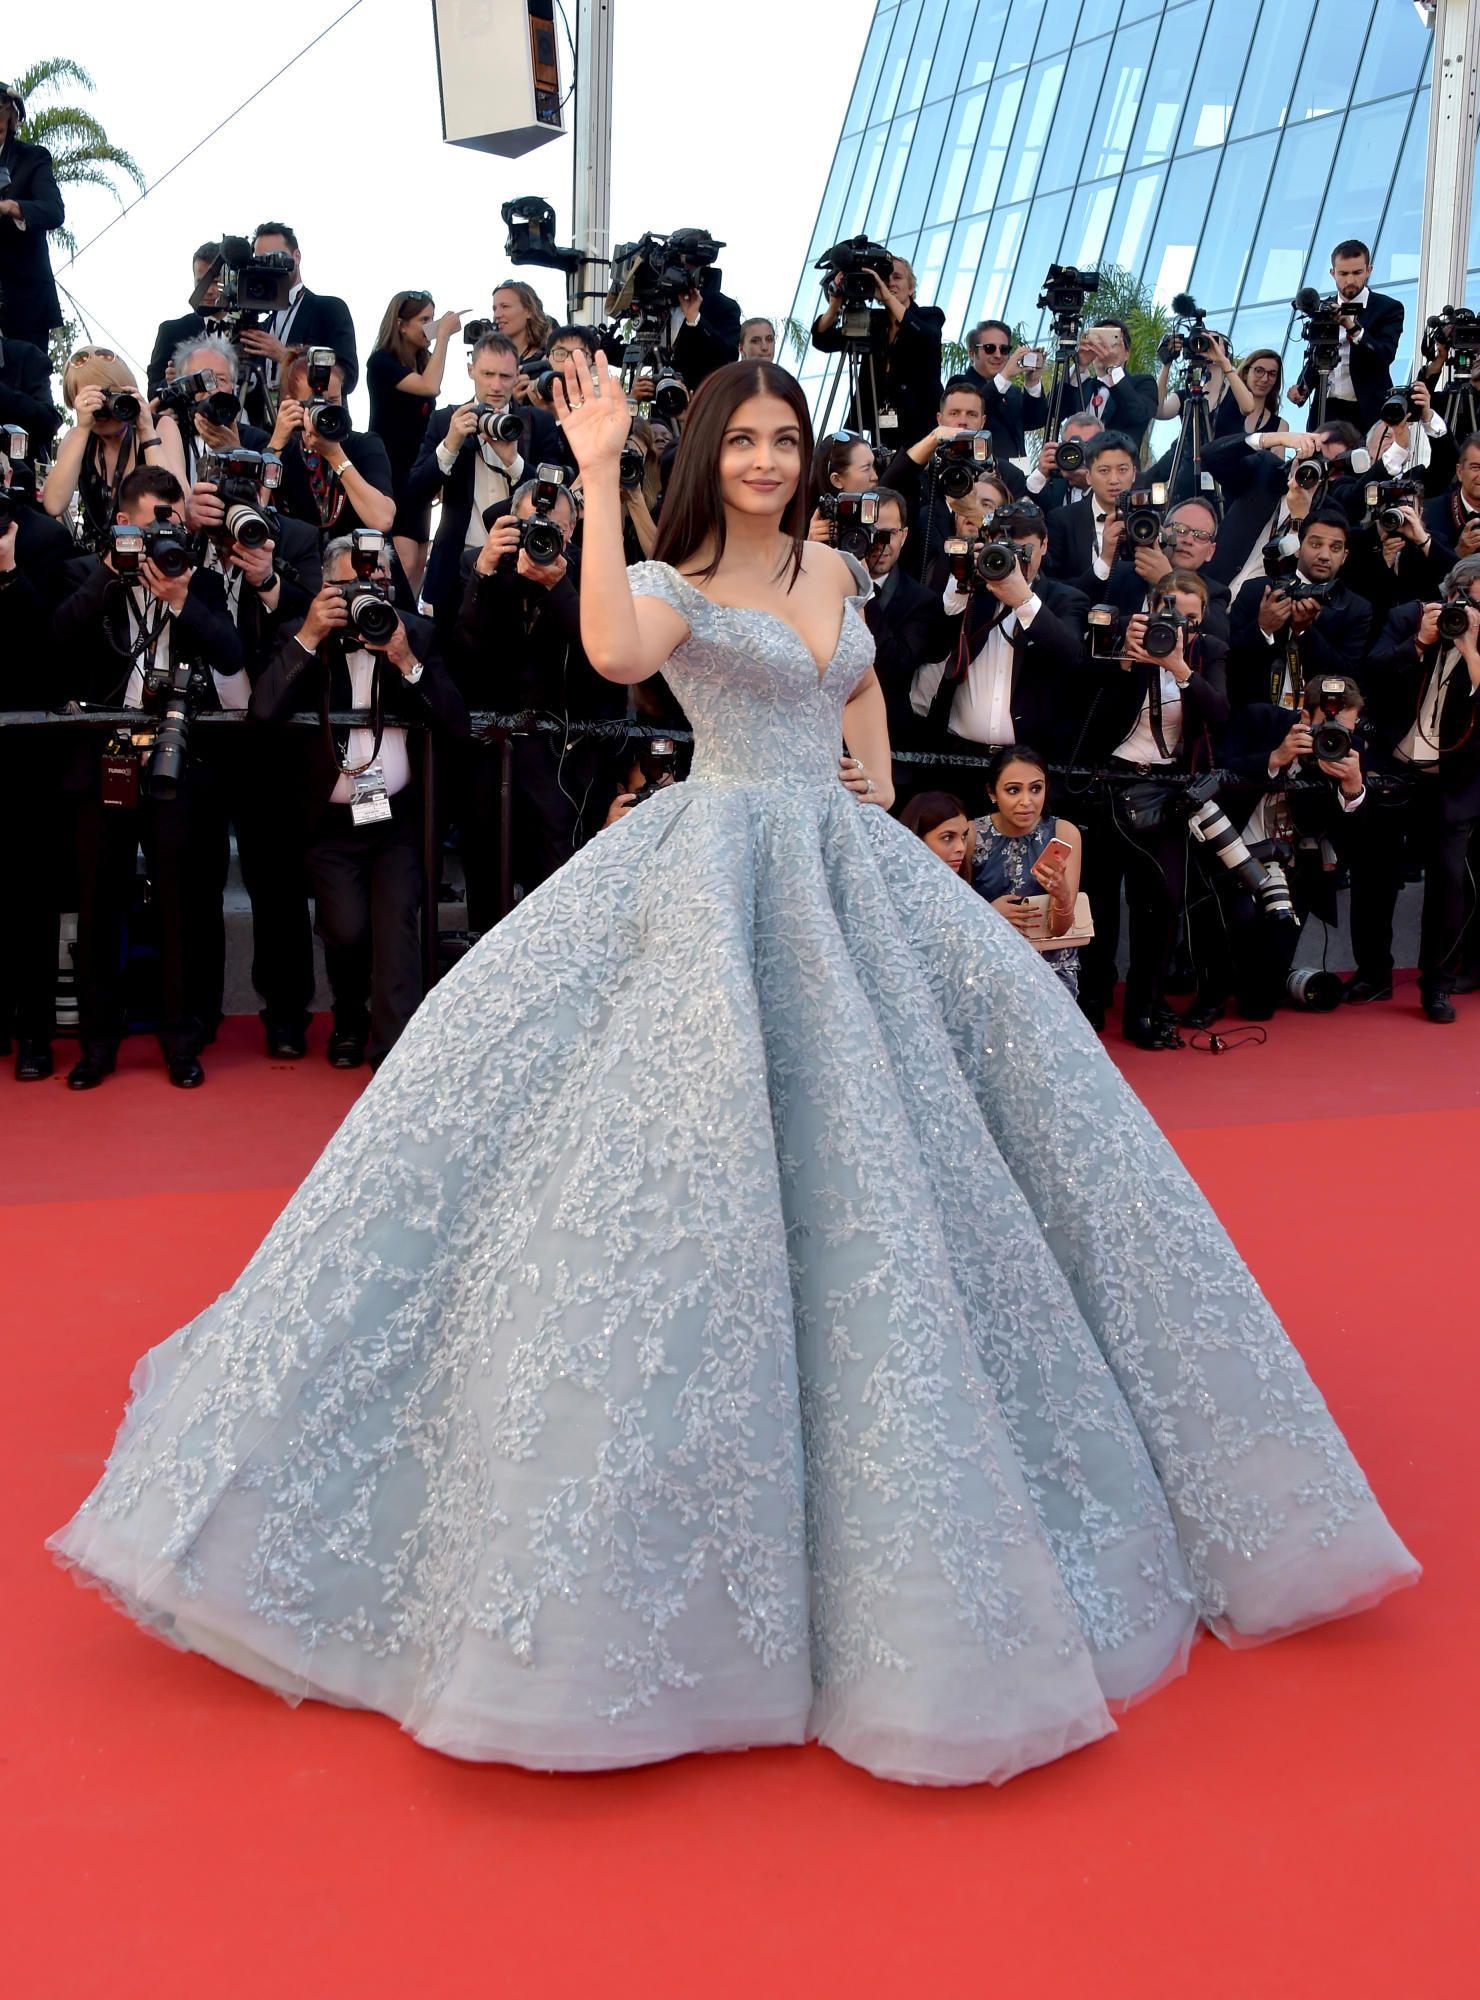 Aishwarya Rai Bachchan in Michael Cinco Couture. Photo: Pascal Le Segretain/Getty Images.